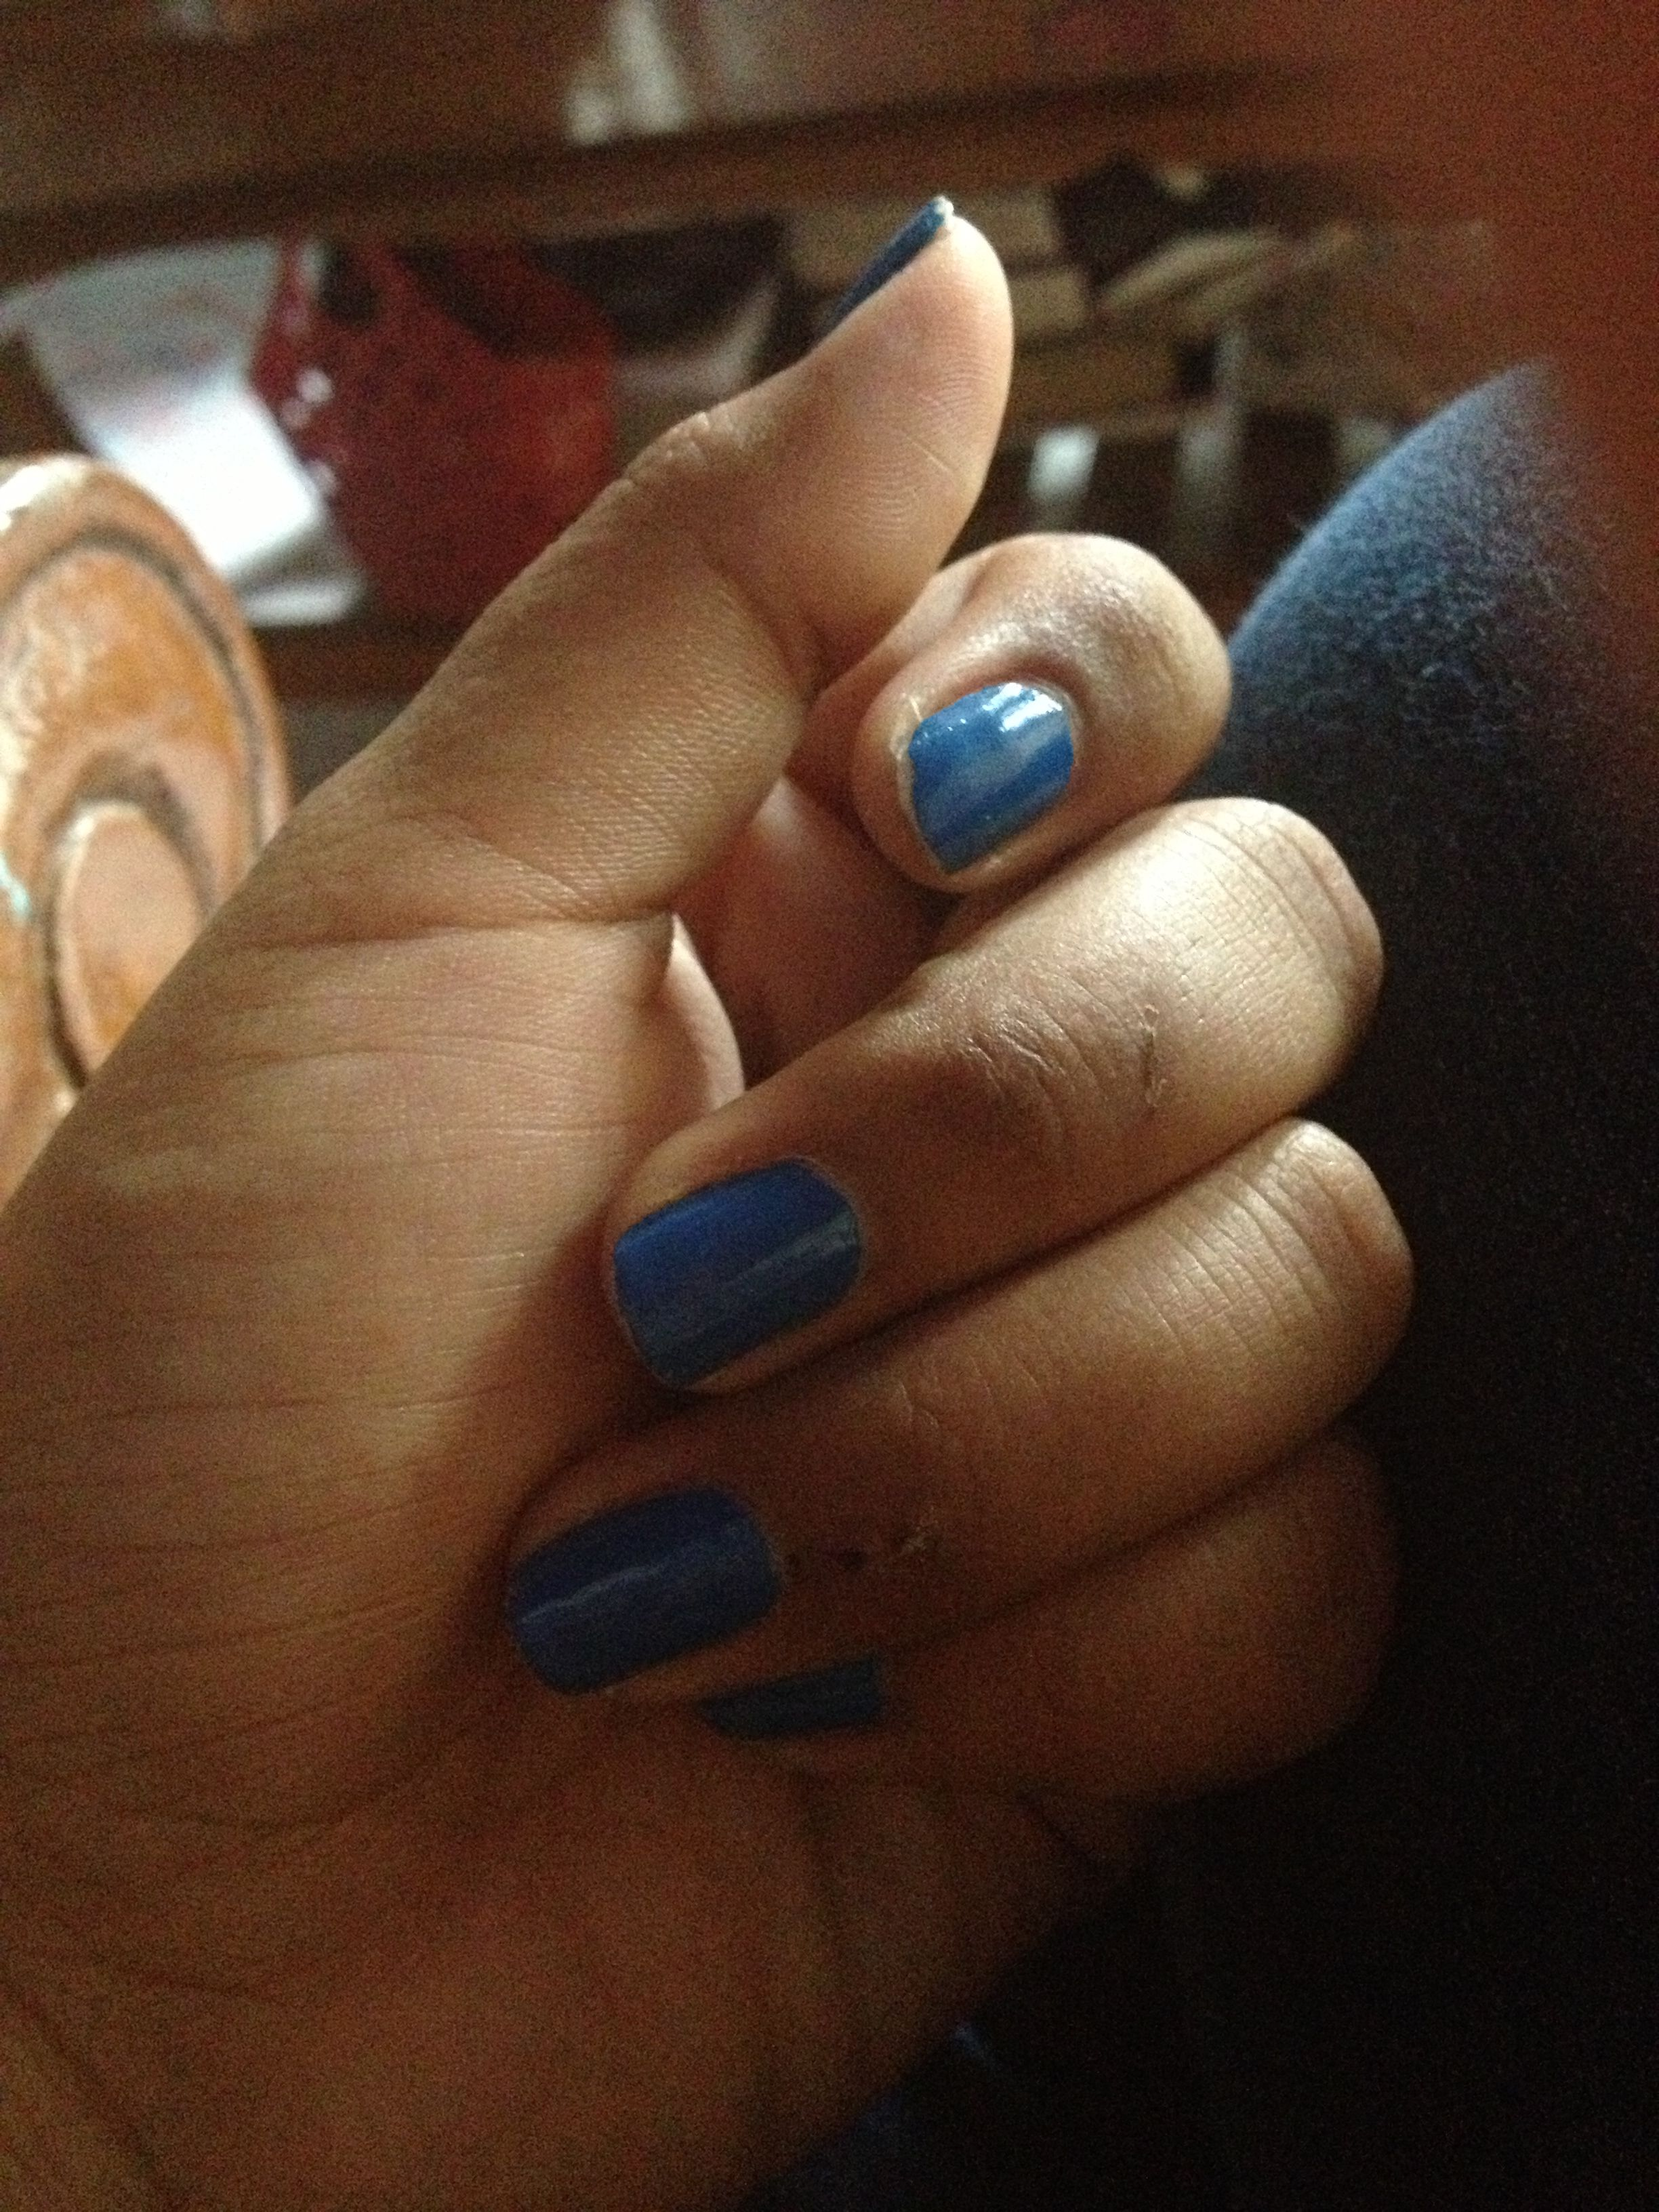 Blue nails swollen fingers lol